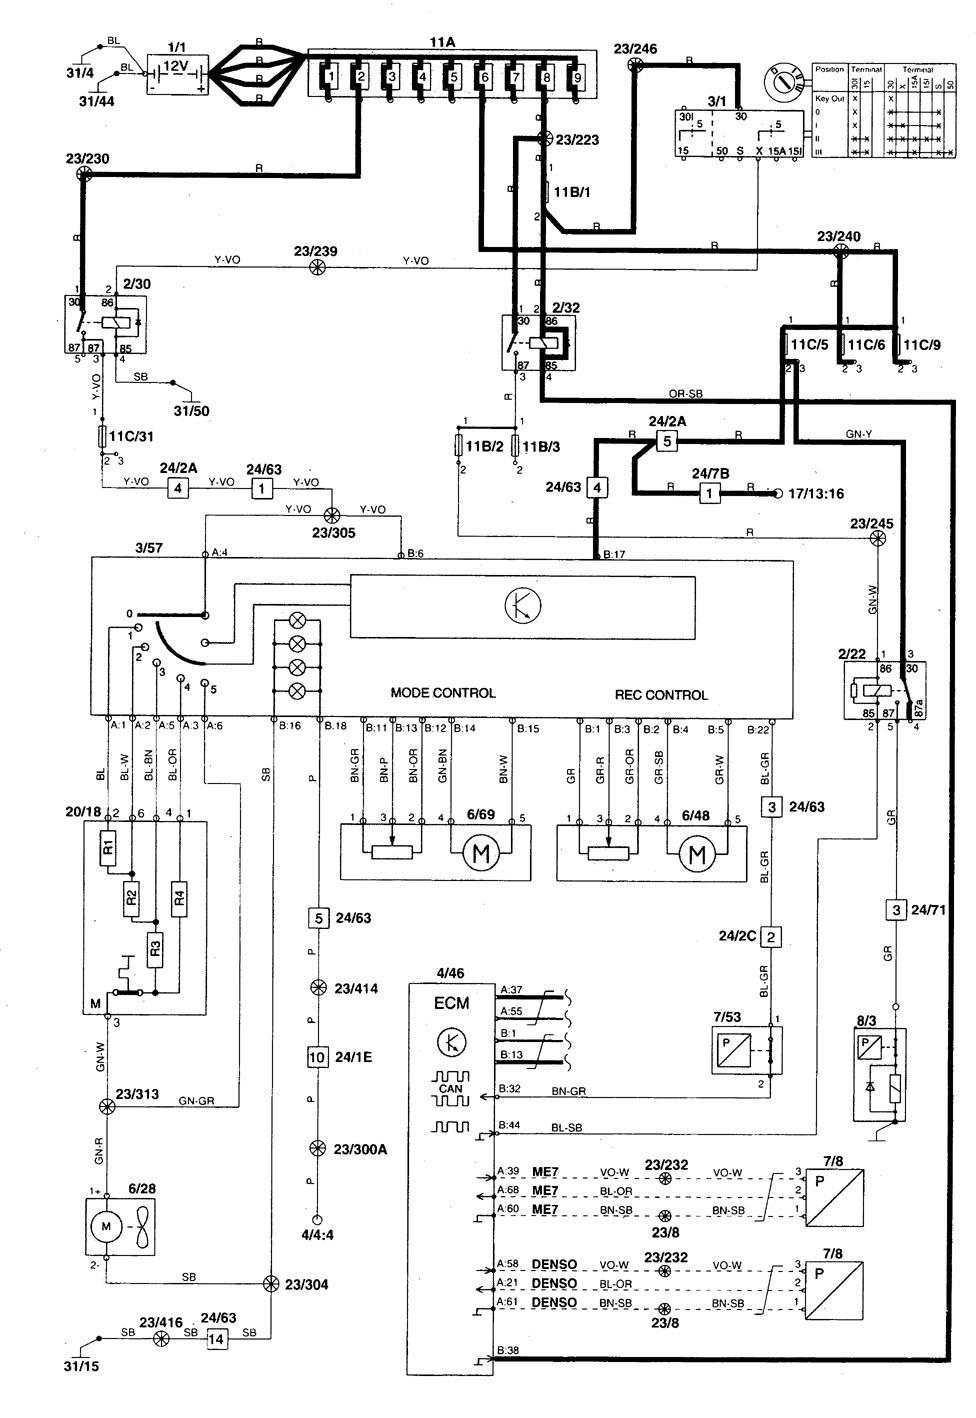 Volvo Vhd Truck Wiring Diagram. Volvo Semi Truck Wiring ... on